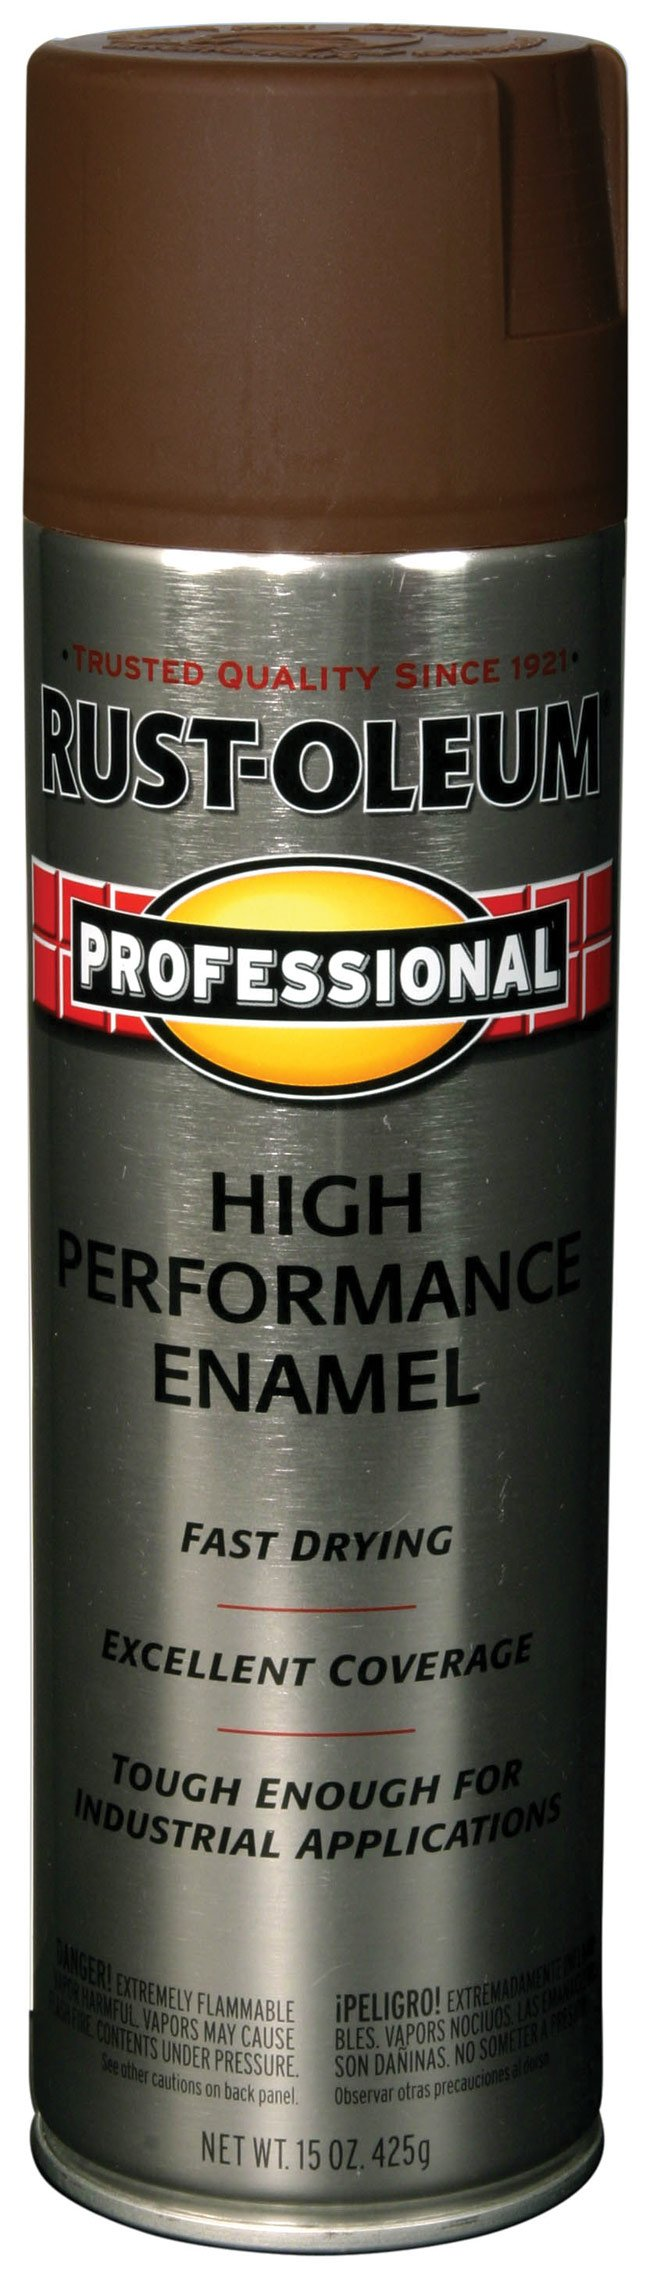 Rust-Oleum 7548838 Professional High Performance Enamel Spray Paint, 15 oz, Dark Brown